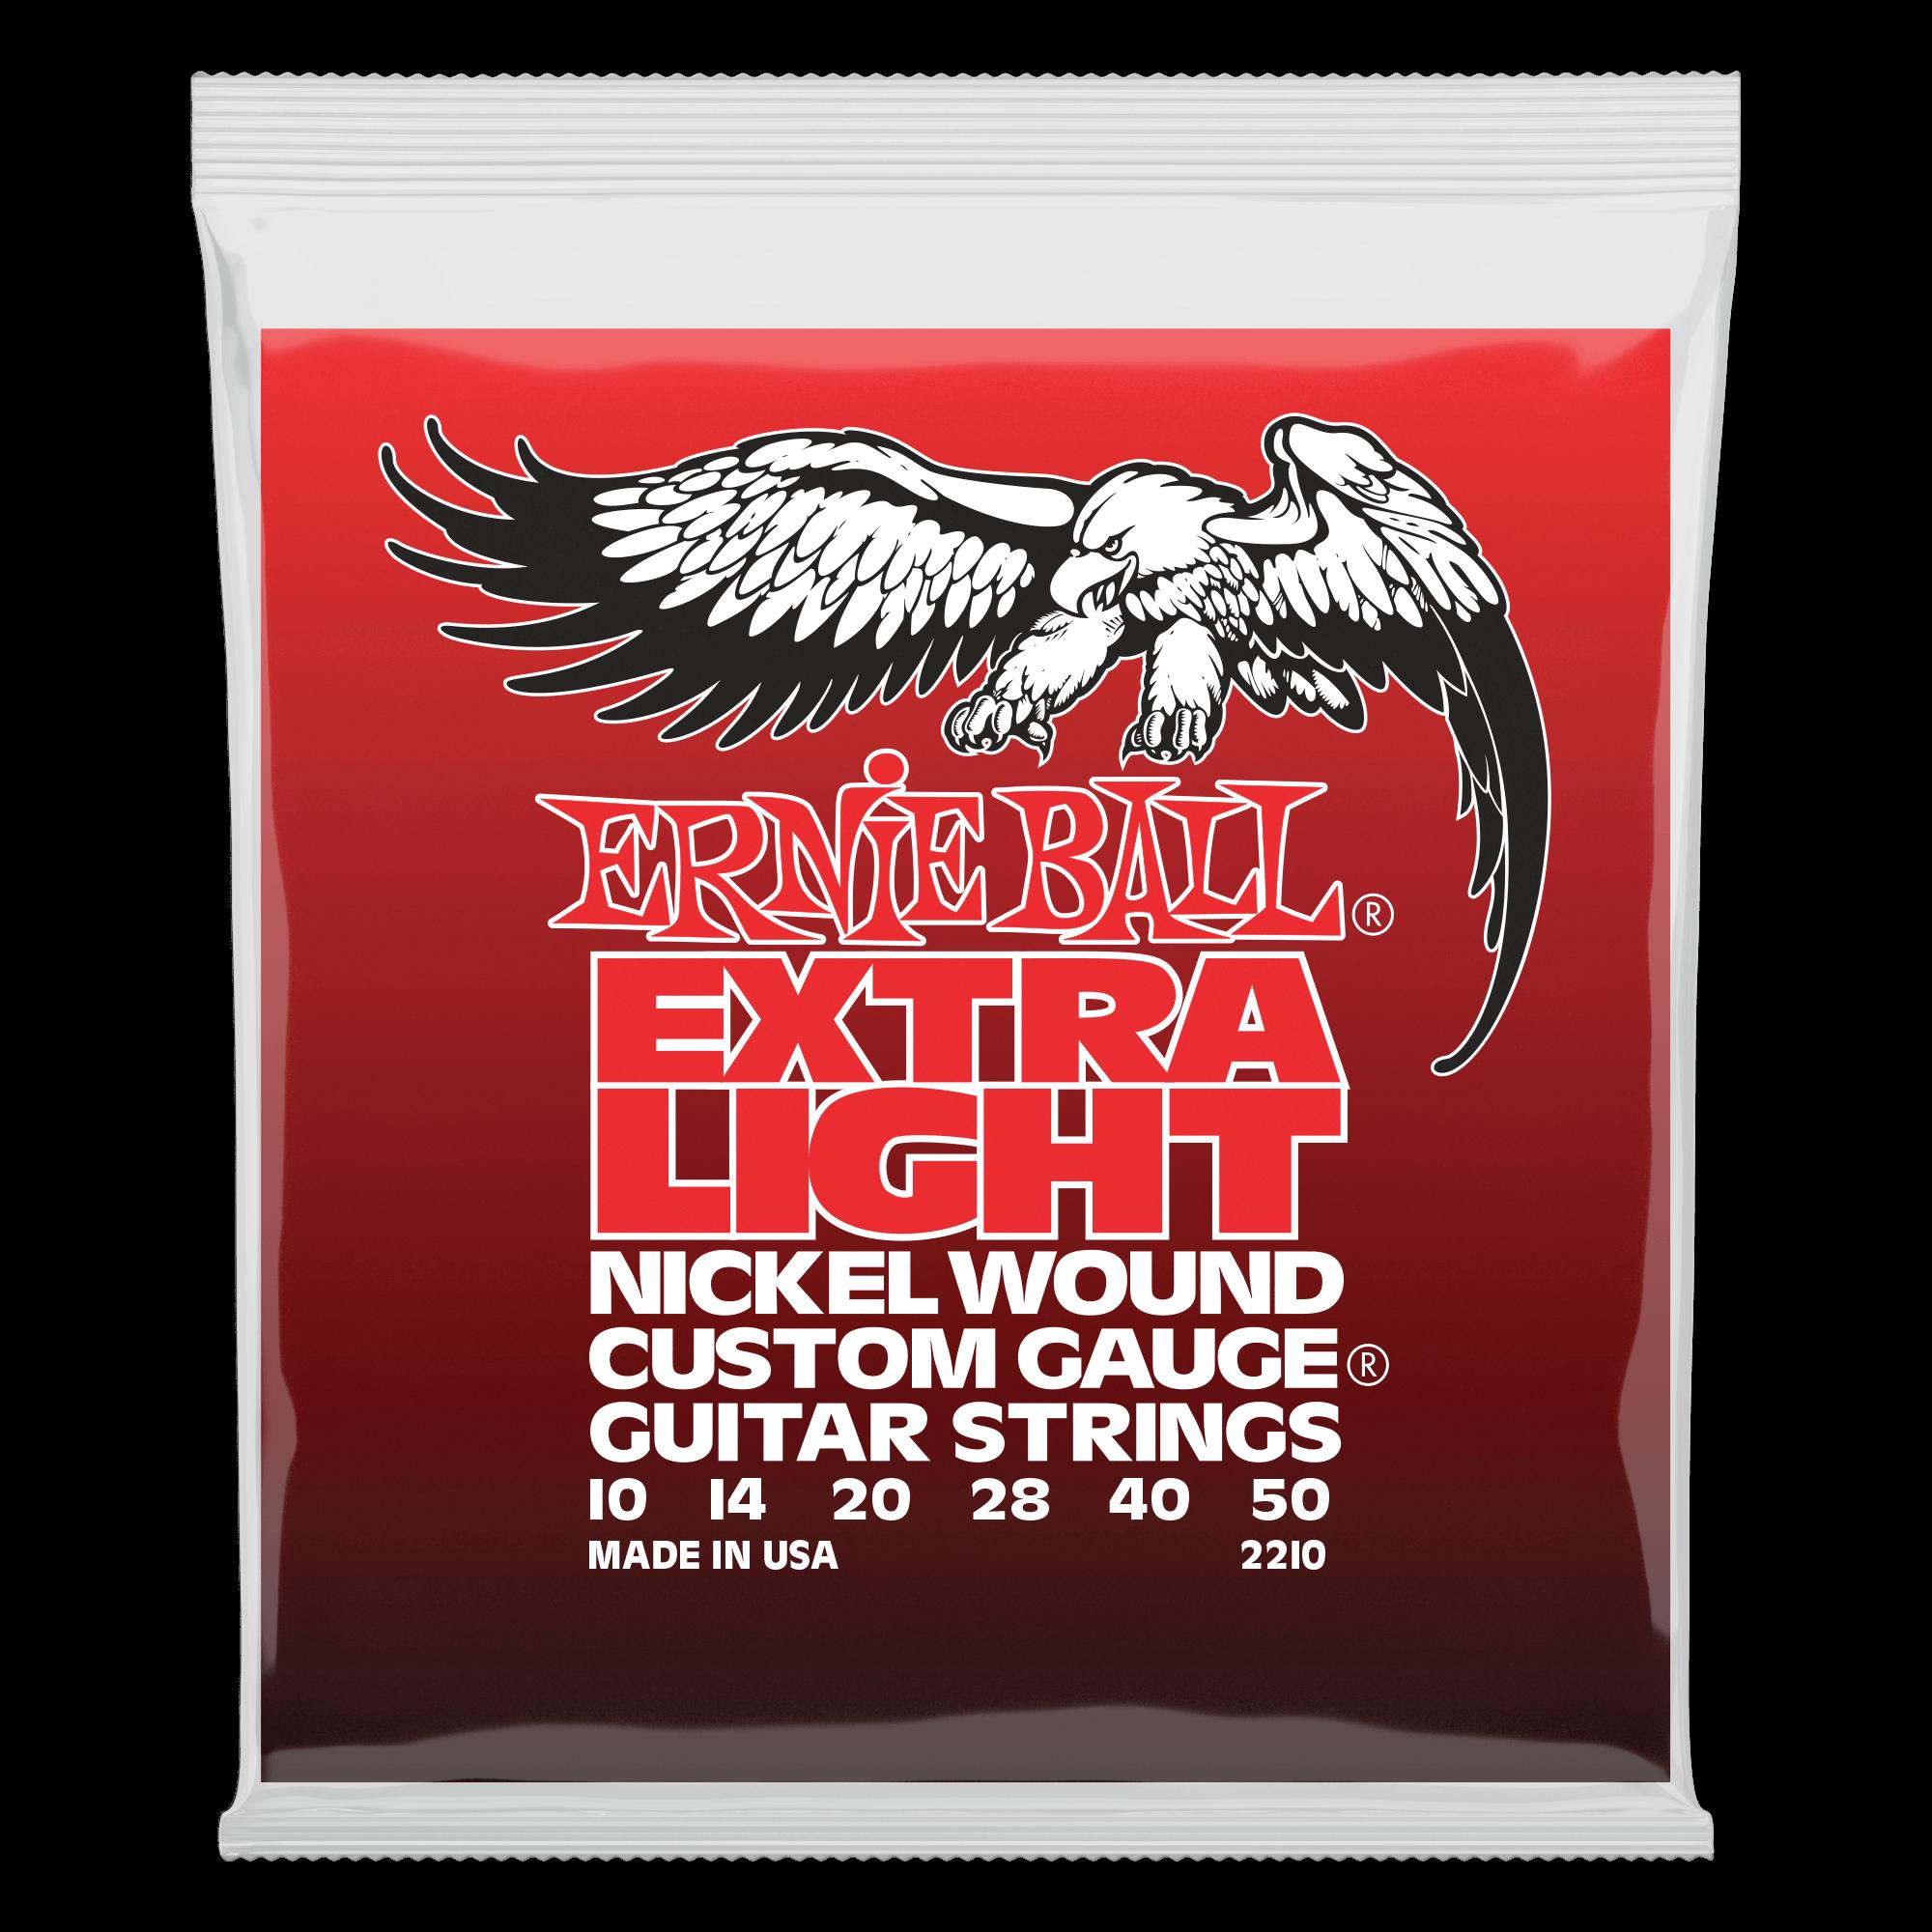 G Electric Nickel Wound Custom Gauge Electric Guitar Strings Ernie Ball